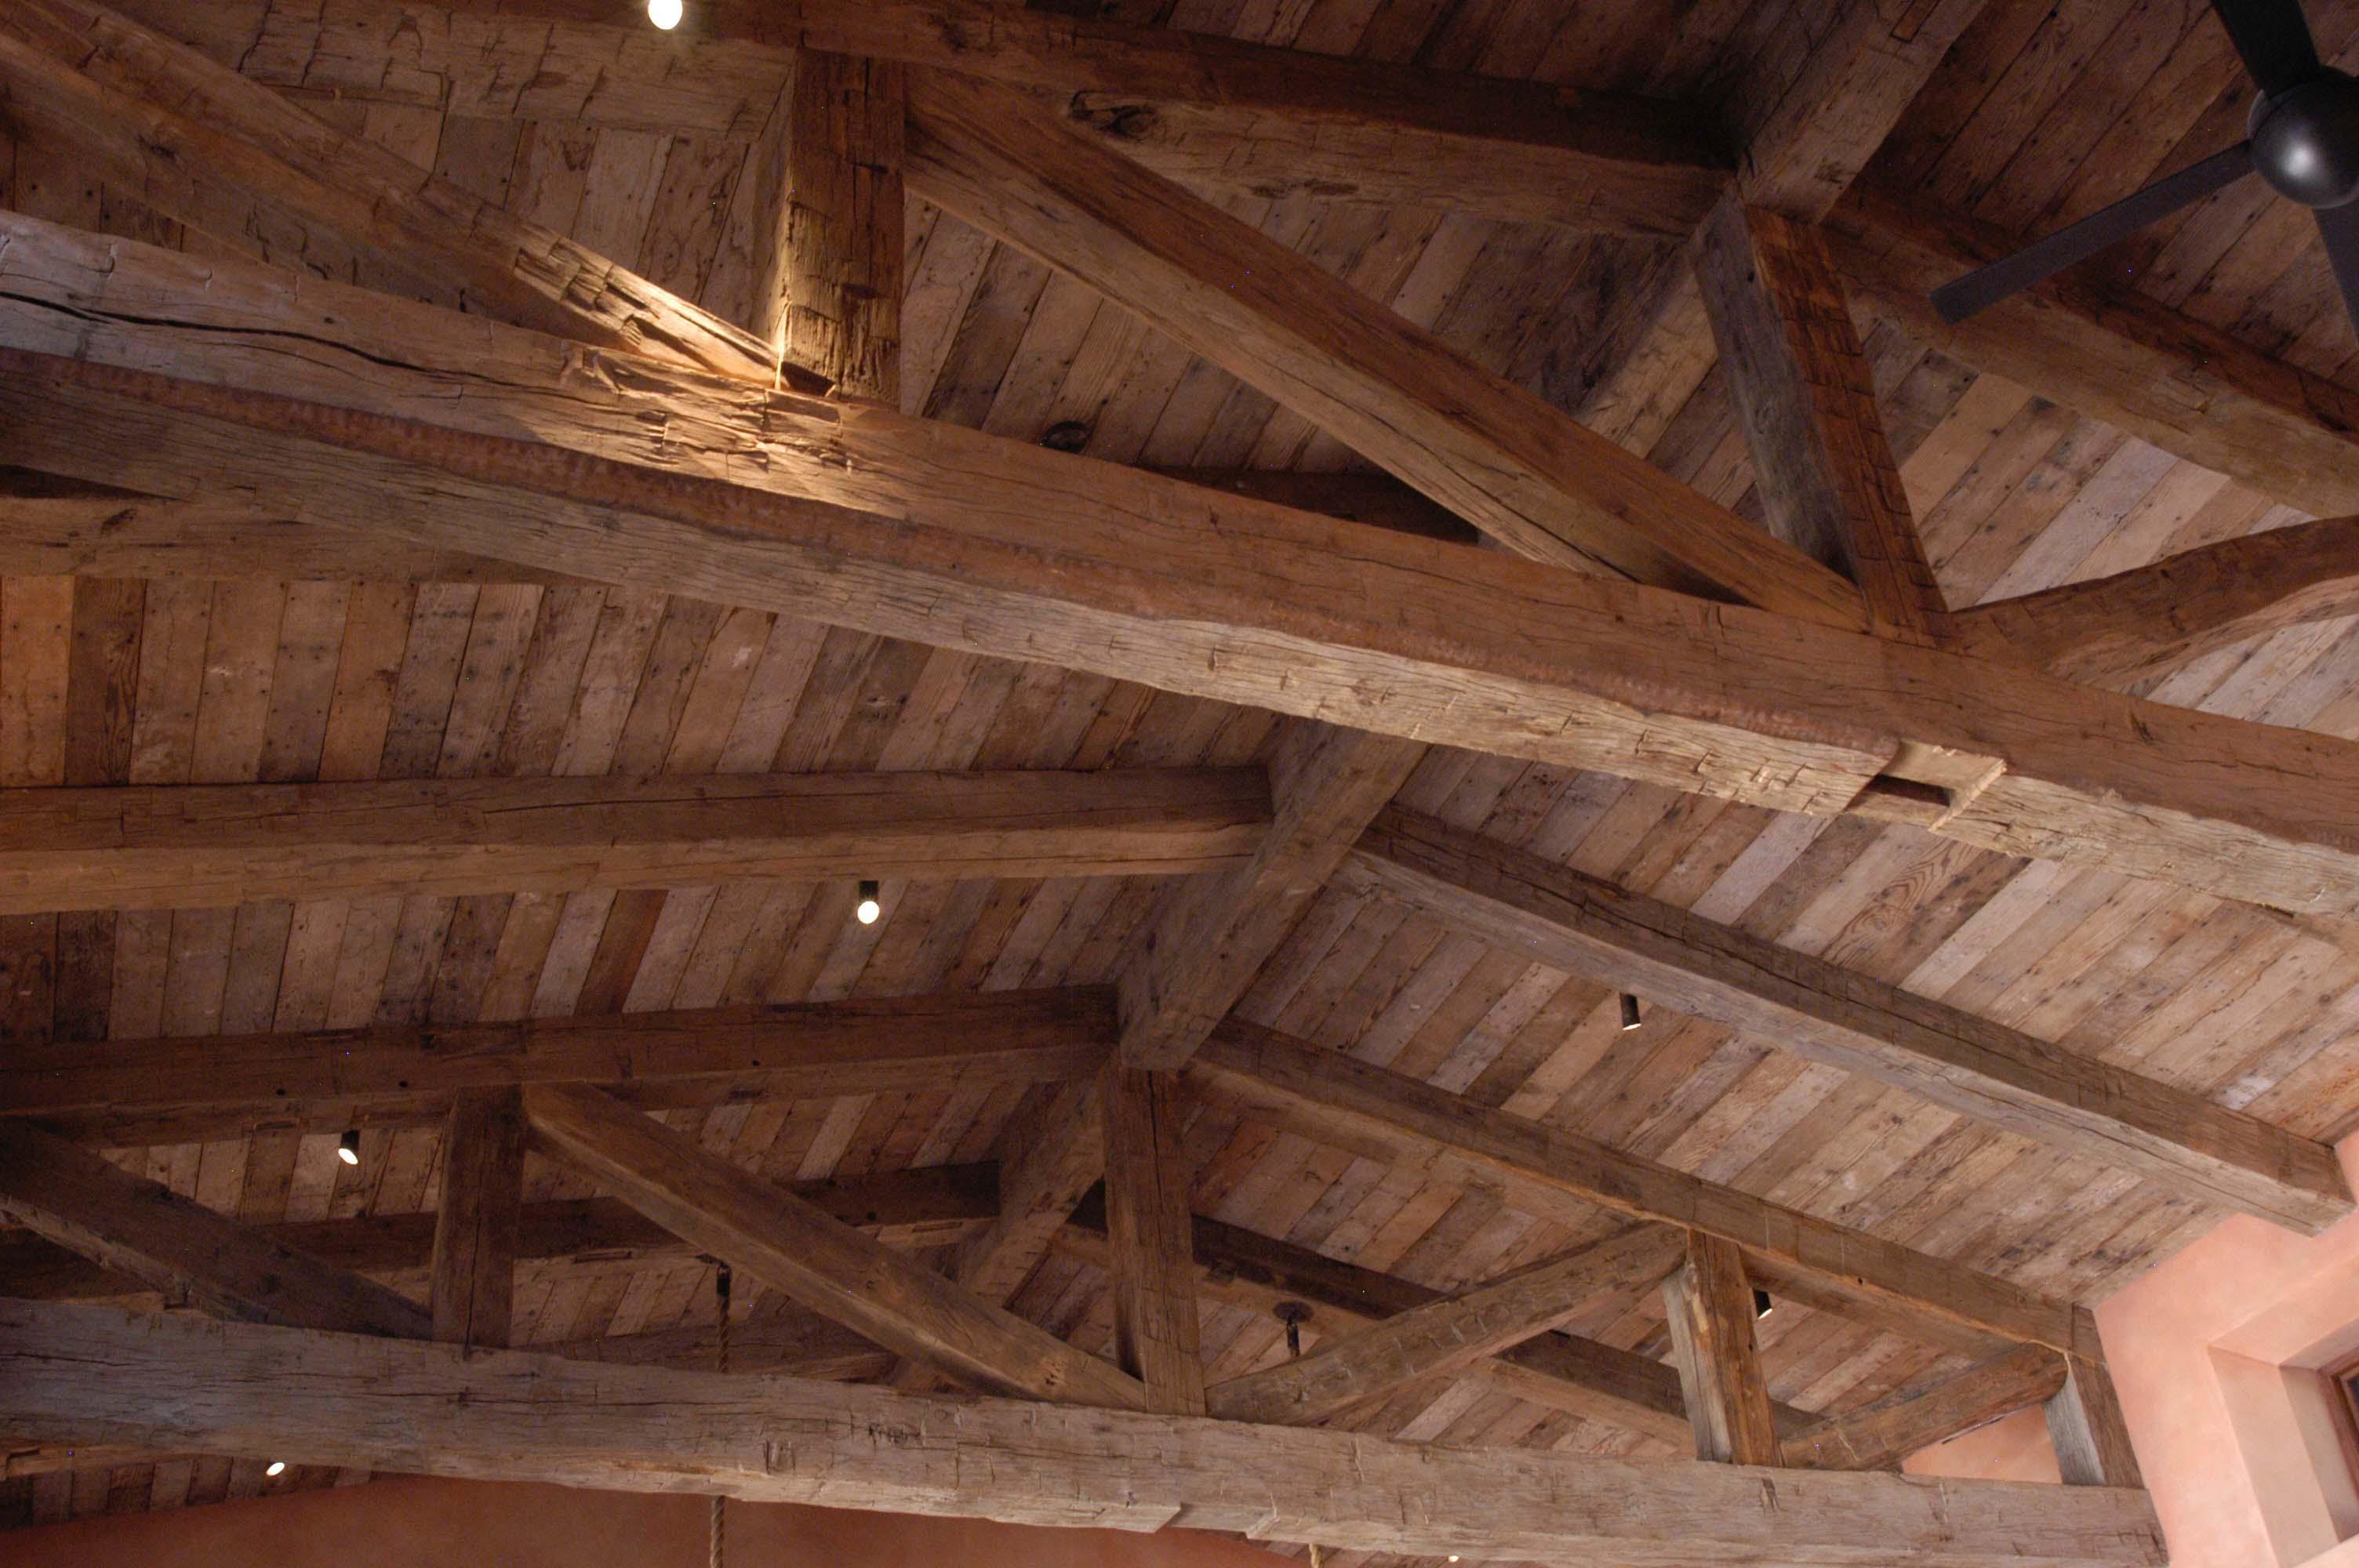 hewn hardwood beams05 - Reclaimed Hardwood Barn Timbers